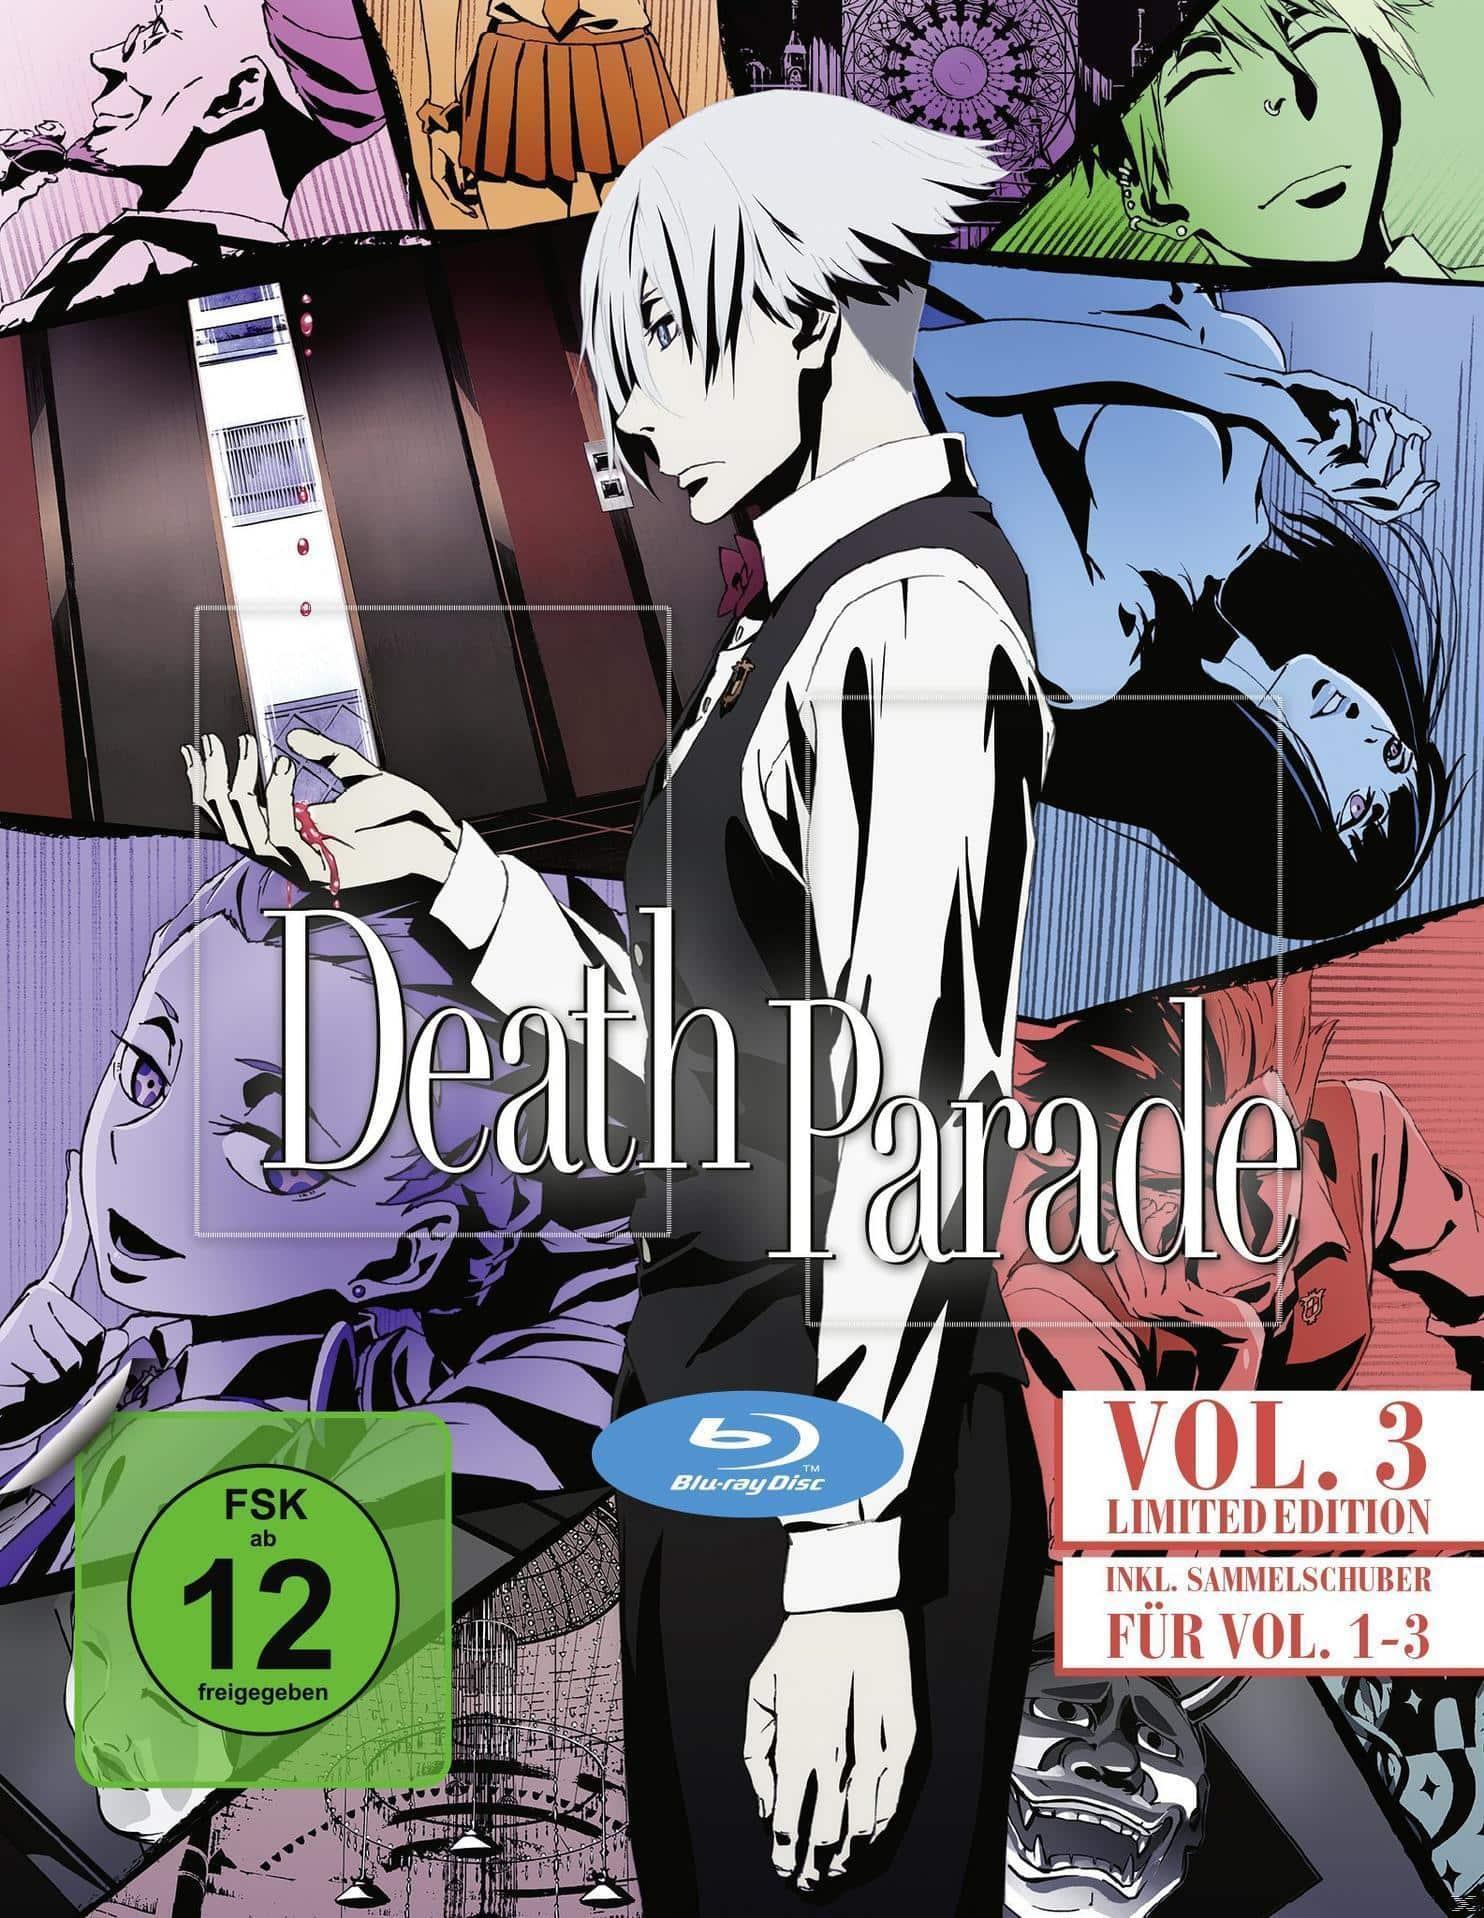 Death Parade - Vol. 3 Limited Edition (BLU-RAY) für 29,99 Euro